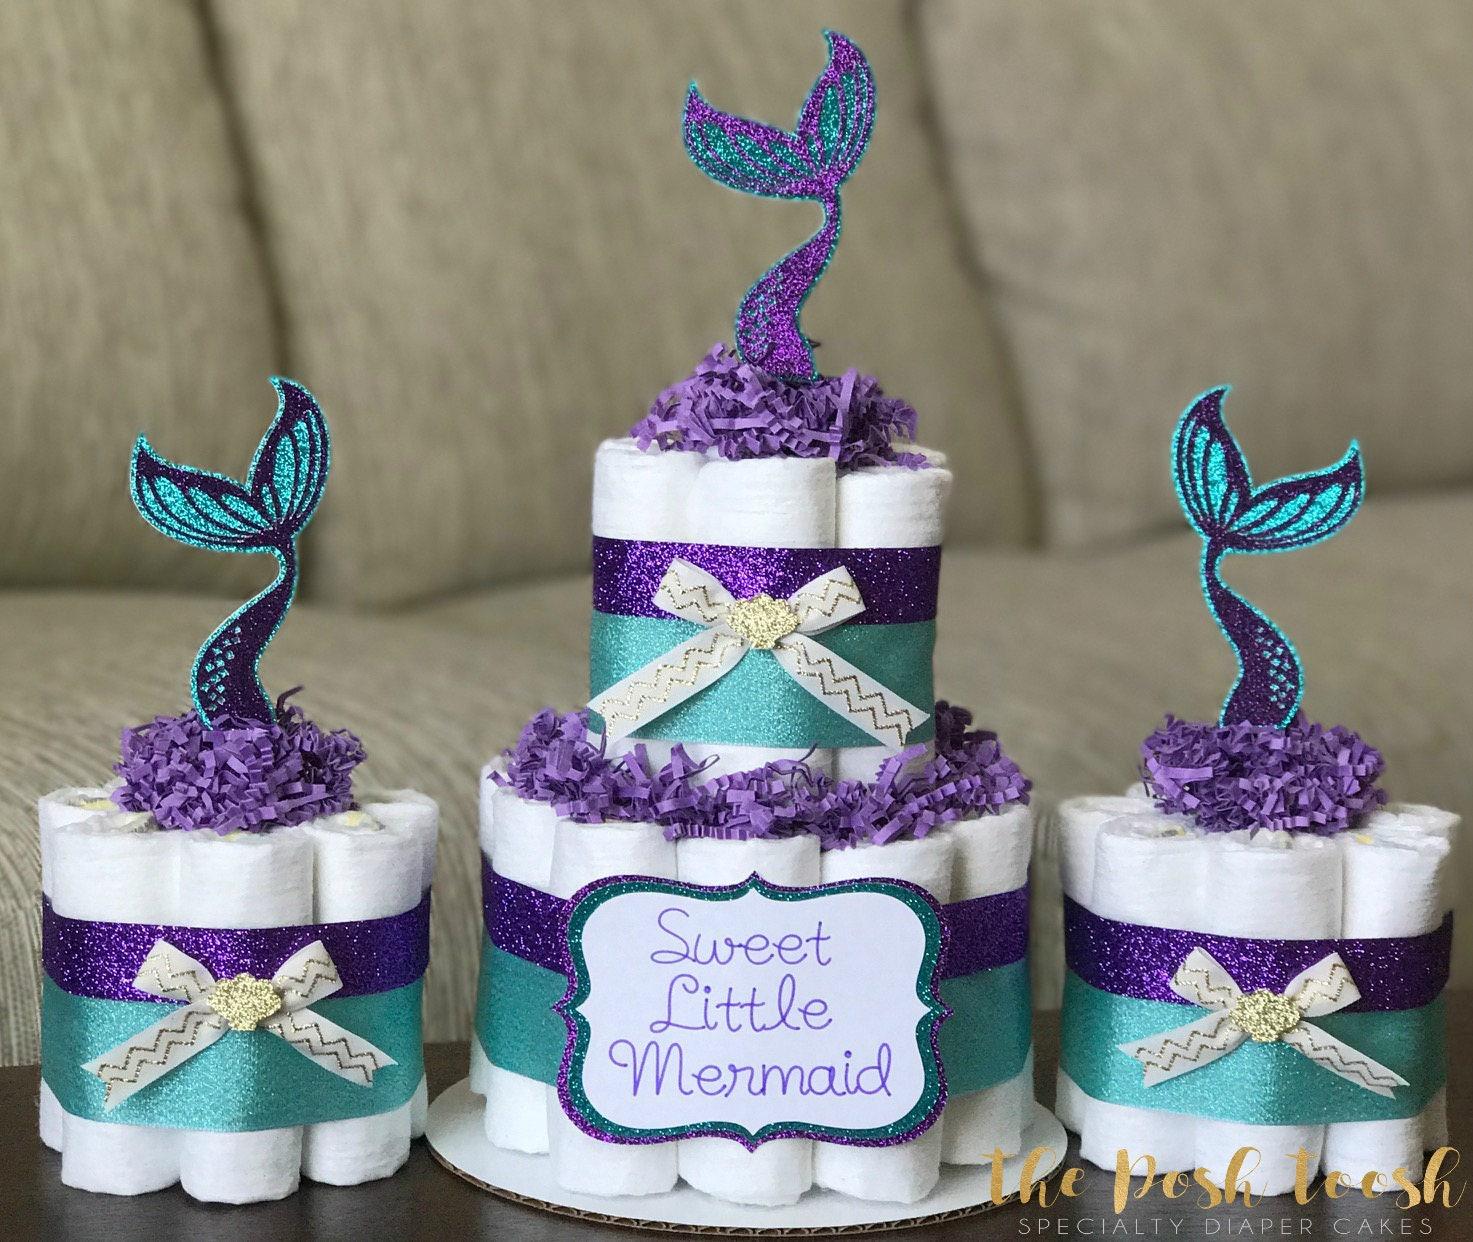 Little Mermaid Diaper Cake Purple Teal Gold Under The Sea